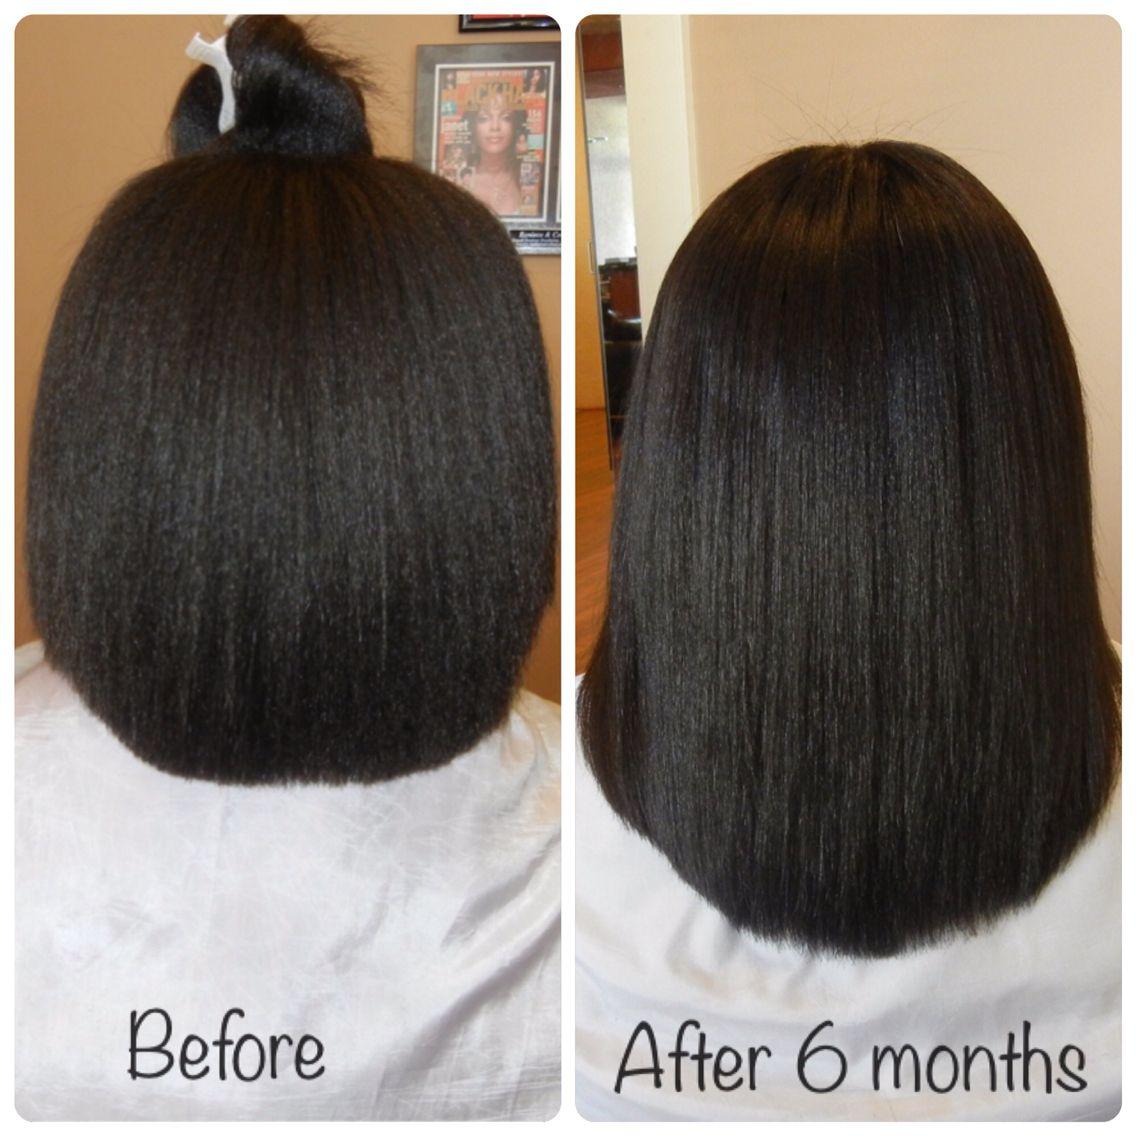 MsKibibi's 6 months hair journey length check. Learn how